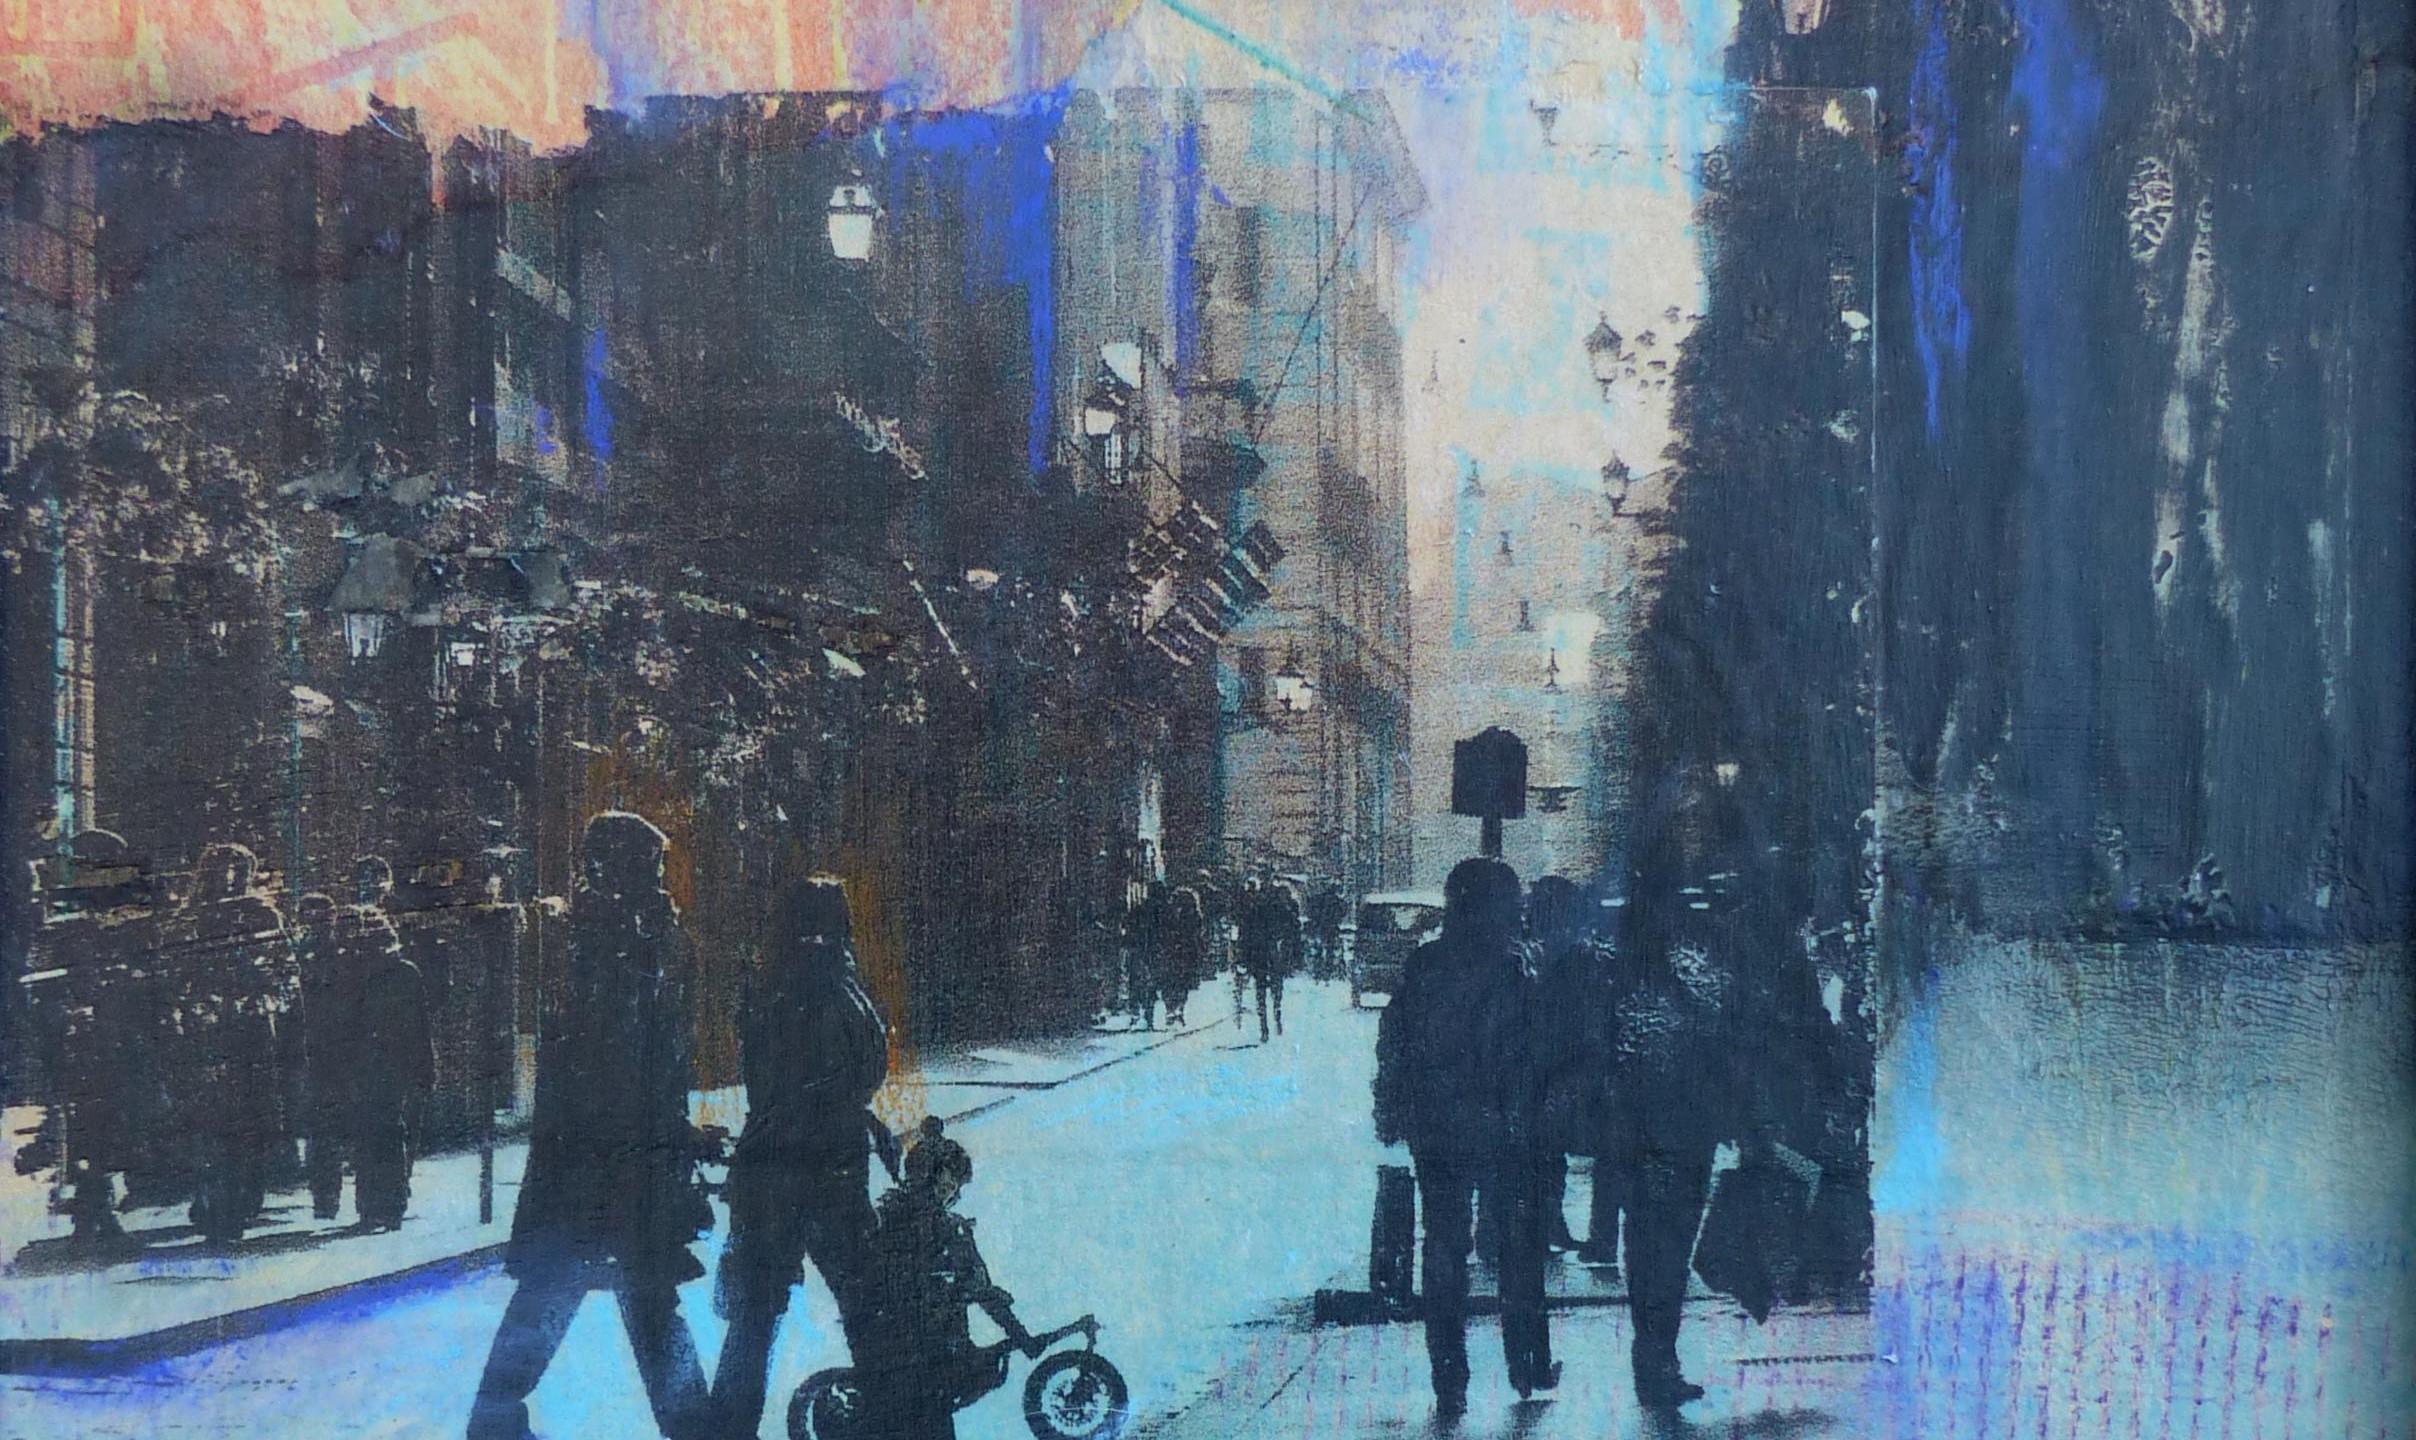 Bonesky, Cynthia - Streets of Rome